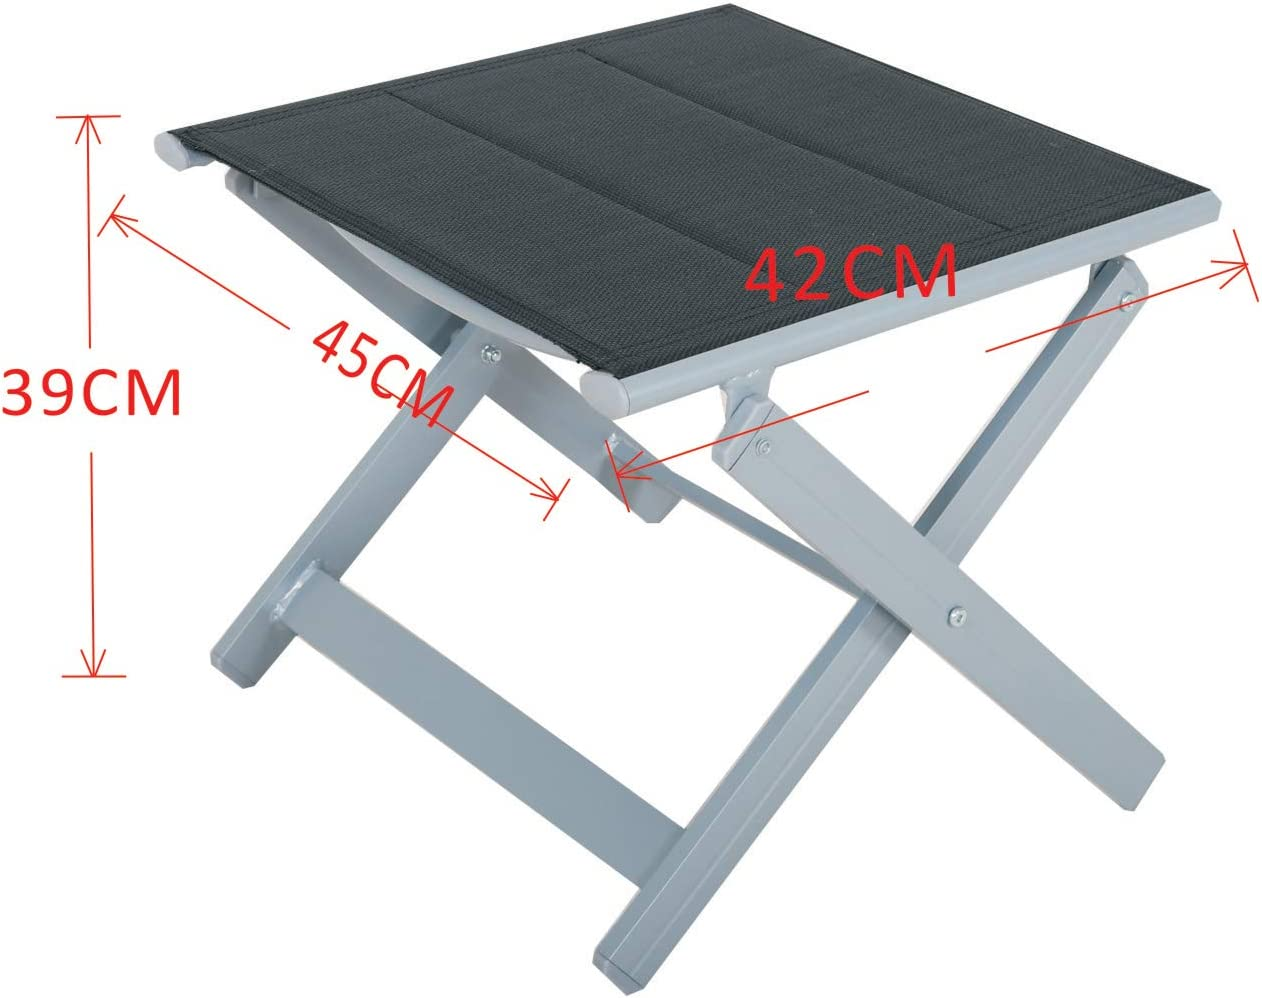 Chicreat Upholstered Footstools Set of 2 Aluminium Black//Silver